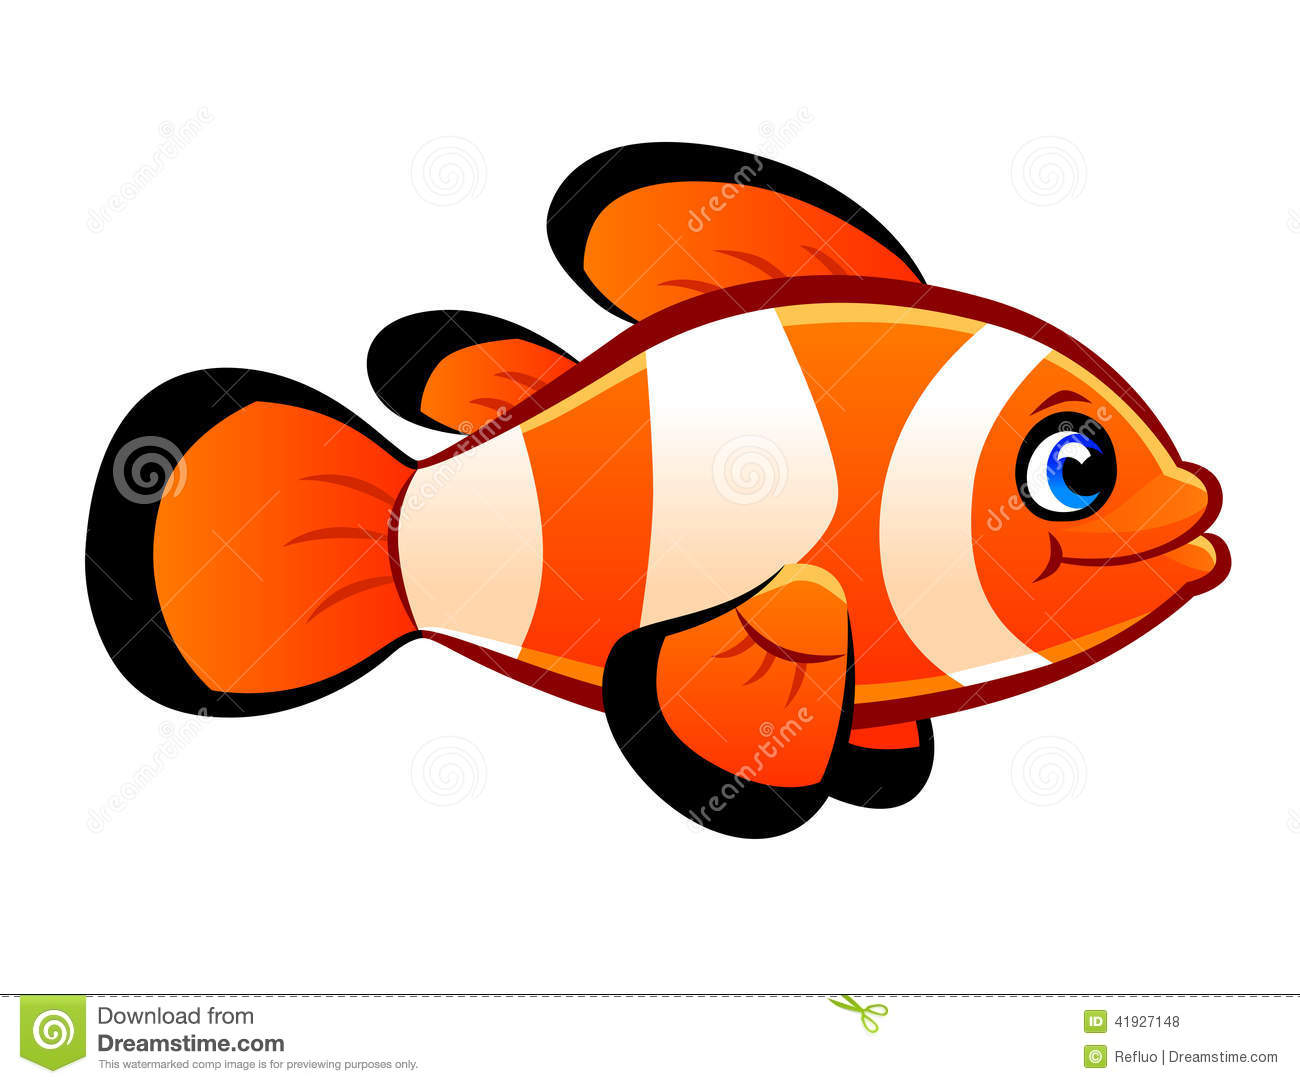 Clownfish Royalty Free Stock Photos-Clownfish Royalty Free Stock Photos-14